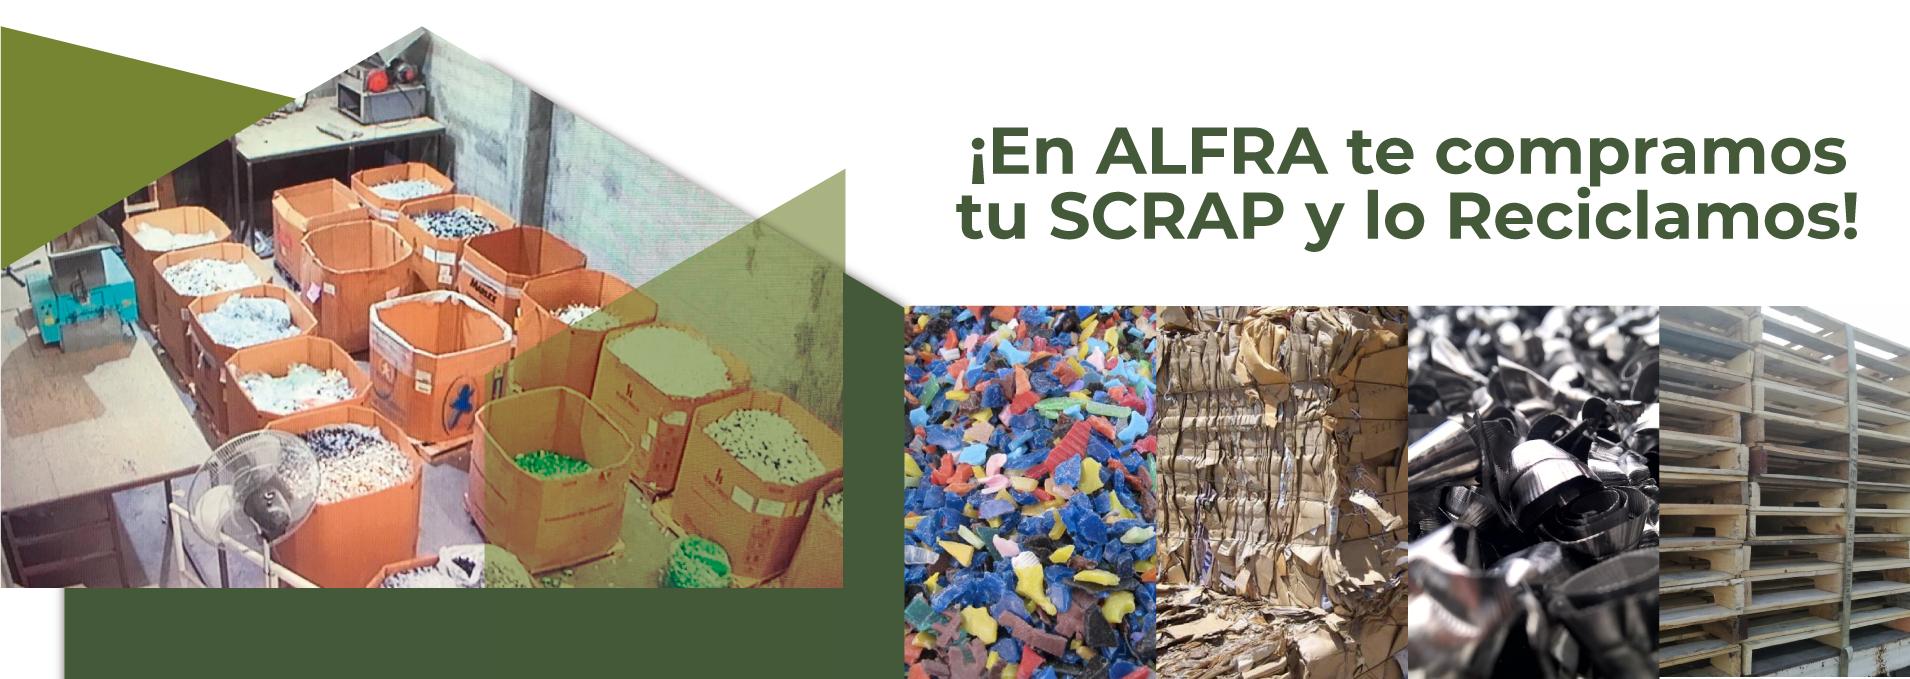 alfra-recycling-portada